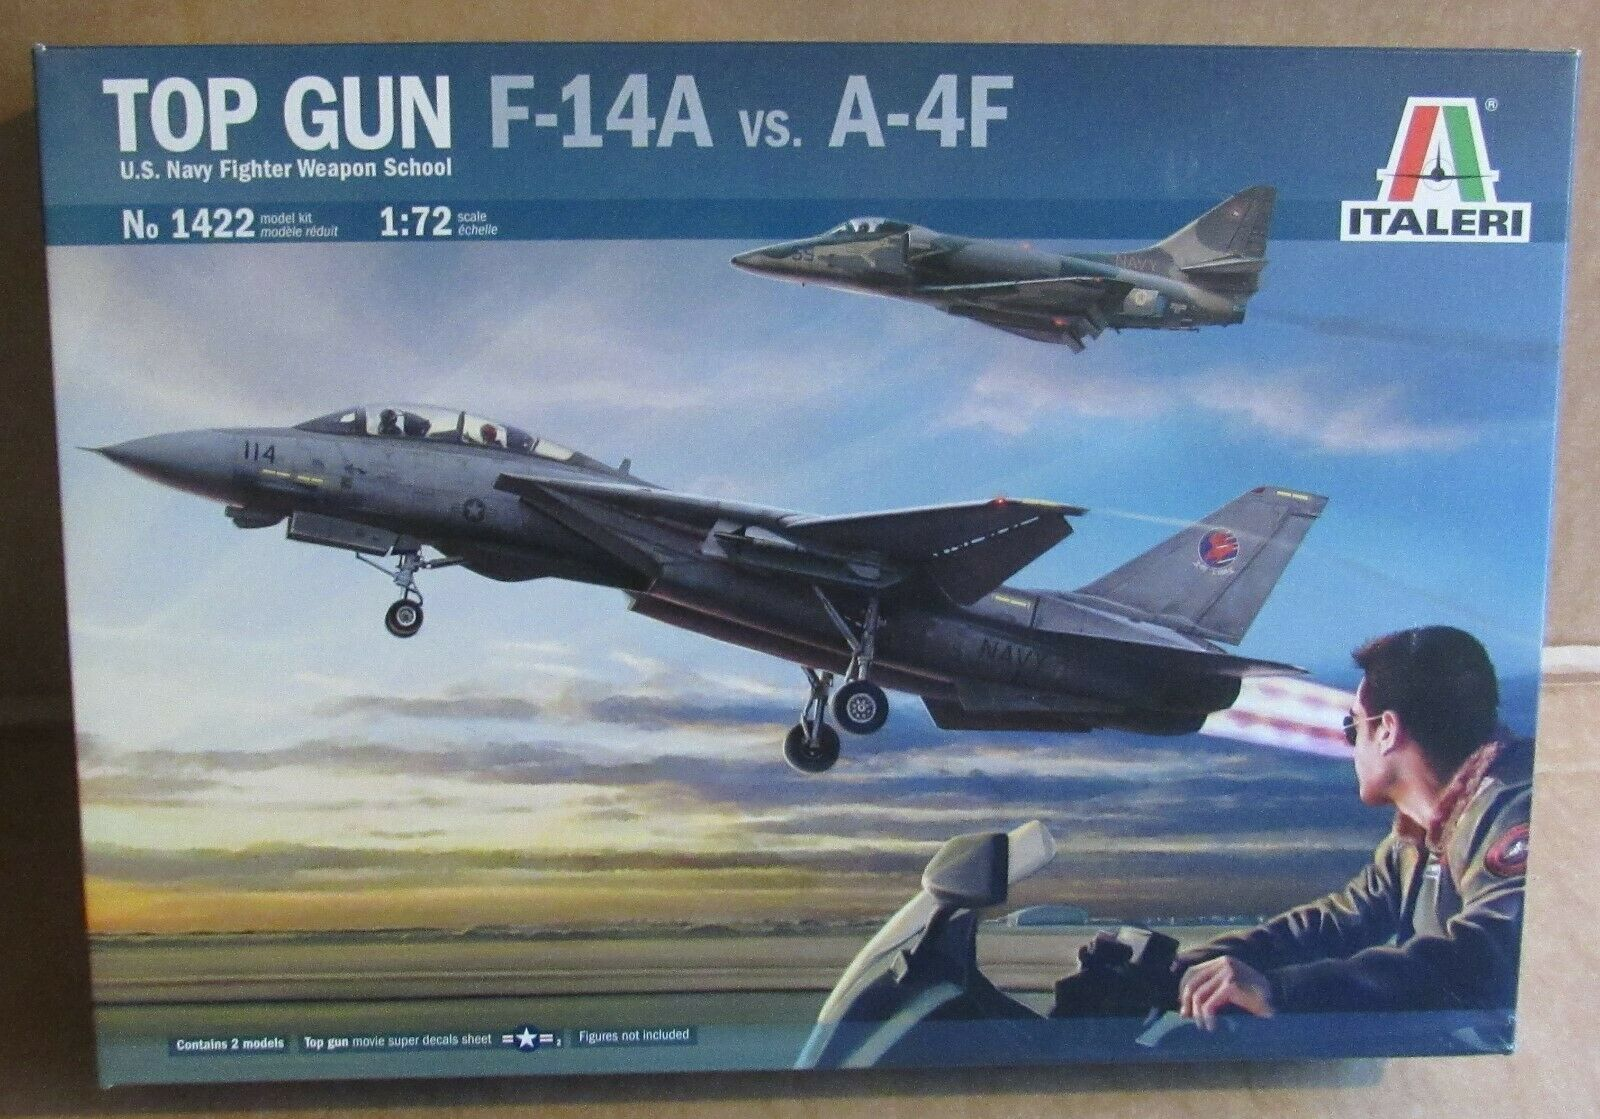 ITALIERI TOP GUN F -14A mot A -4F 1 72 SCALmodellllerL KIS U.S. NAVY kämpe SCHOOL